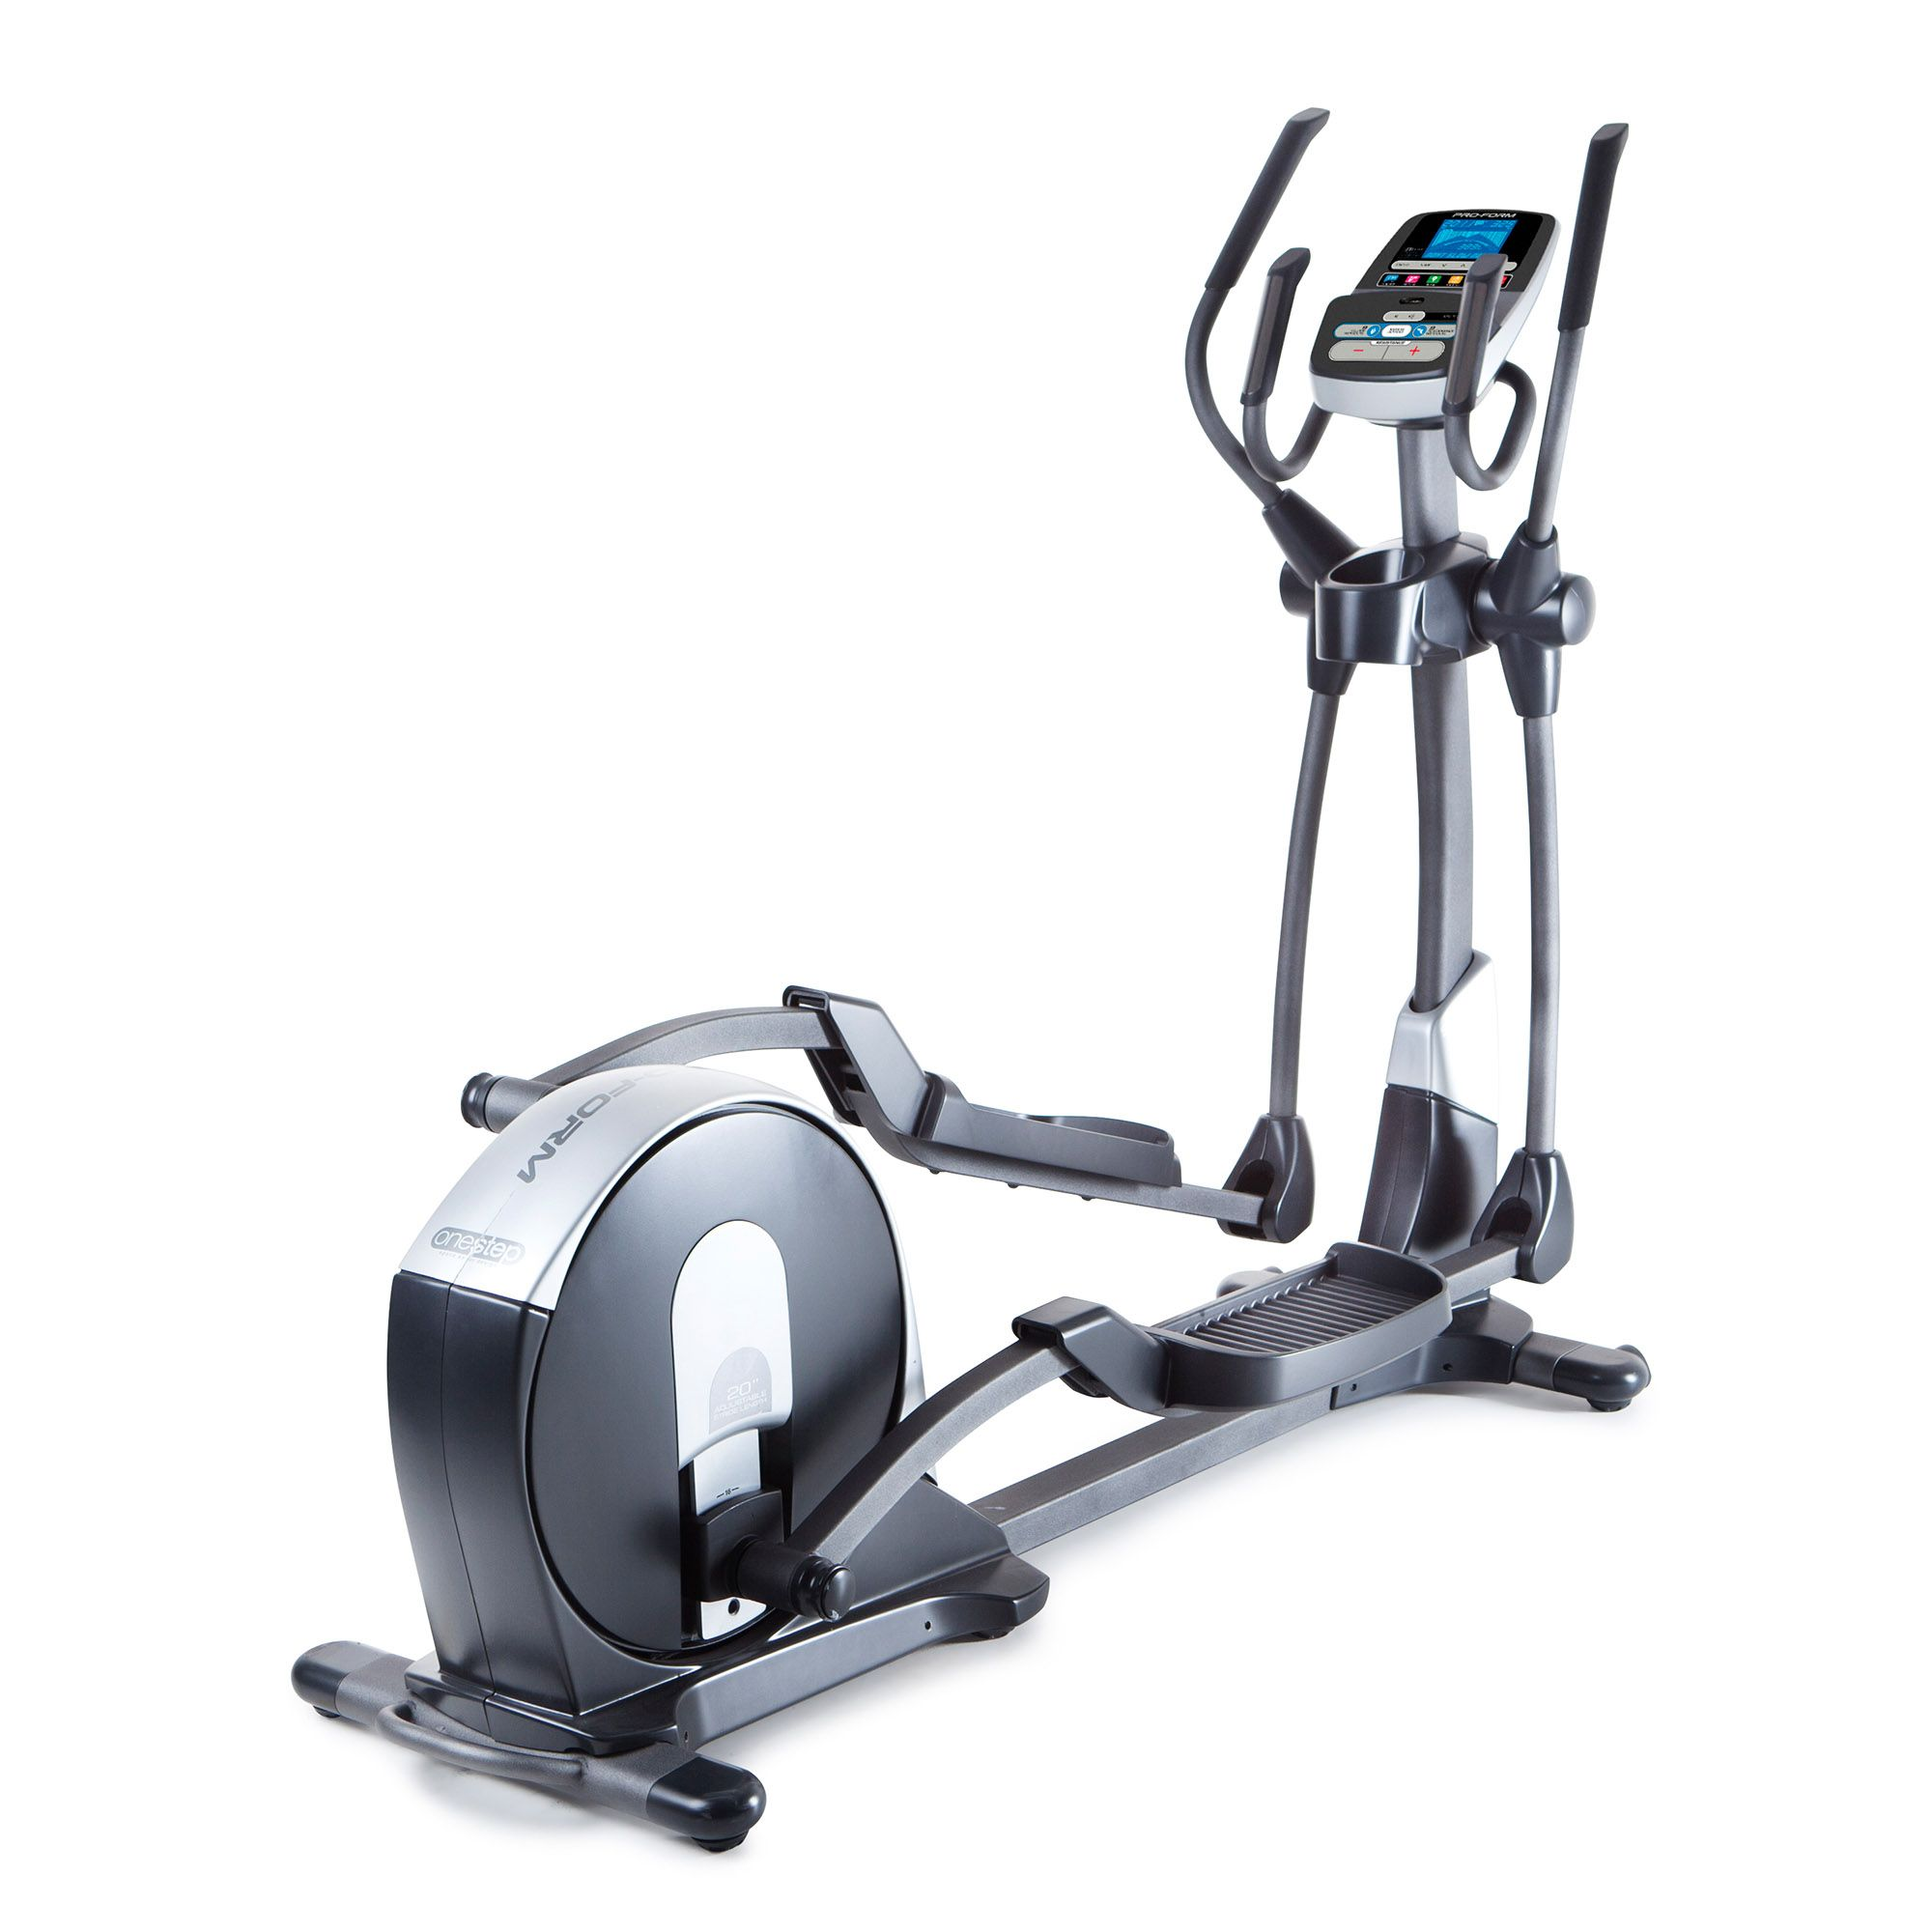 ProForm 720 ZLE Elliptical Cross Trainer - Sweatband.com